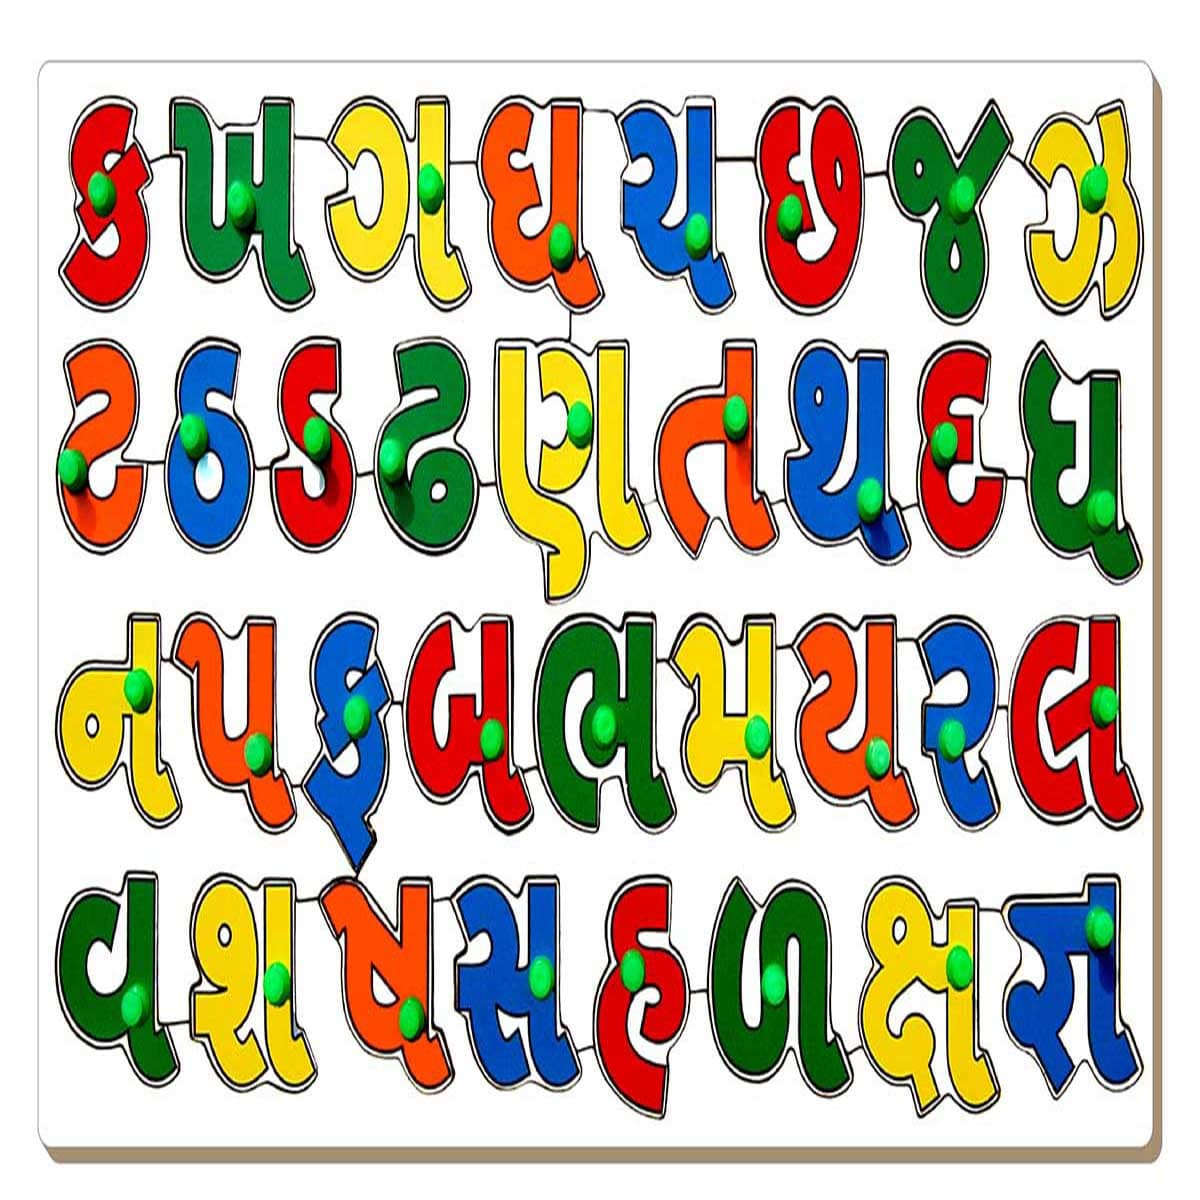 Gujarati Alphabet Image